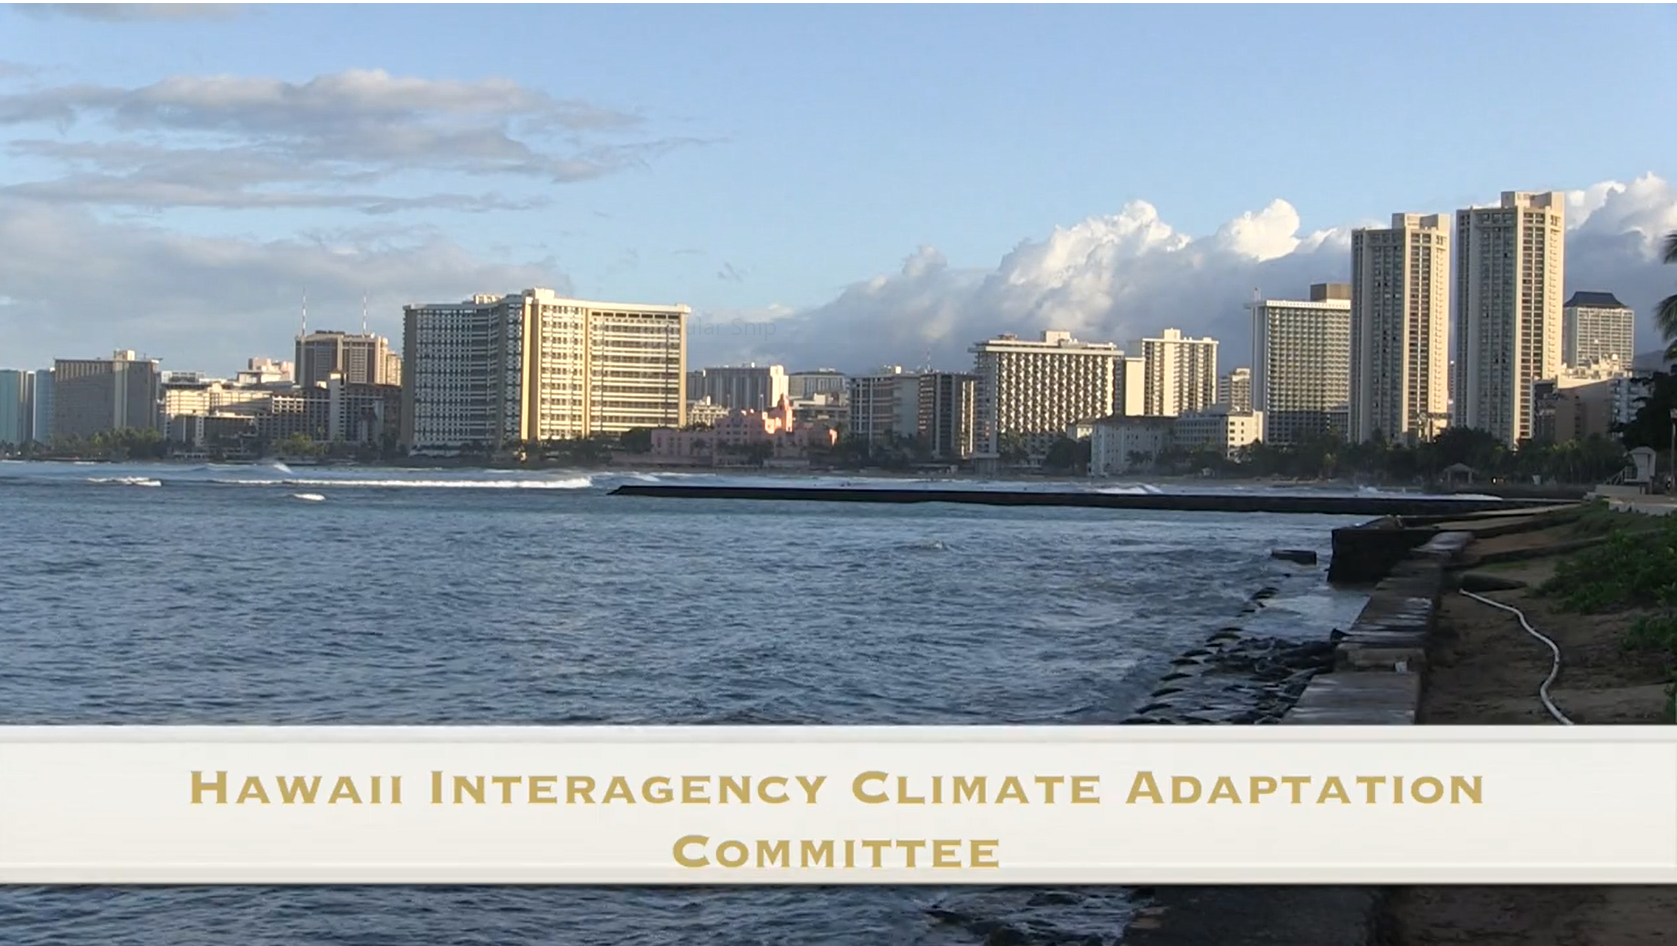 Hawaii-Interagency-Climate-Adaptation-Committee